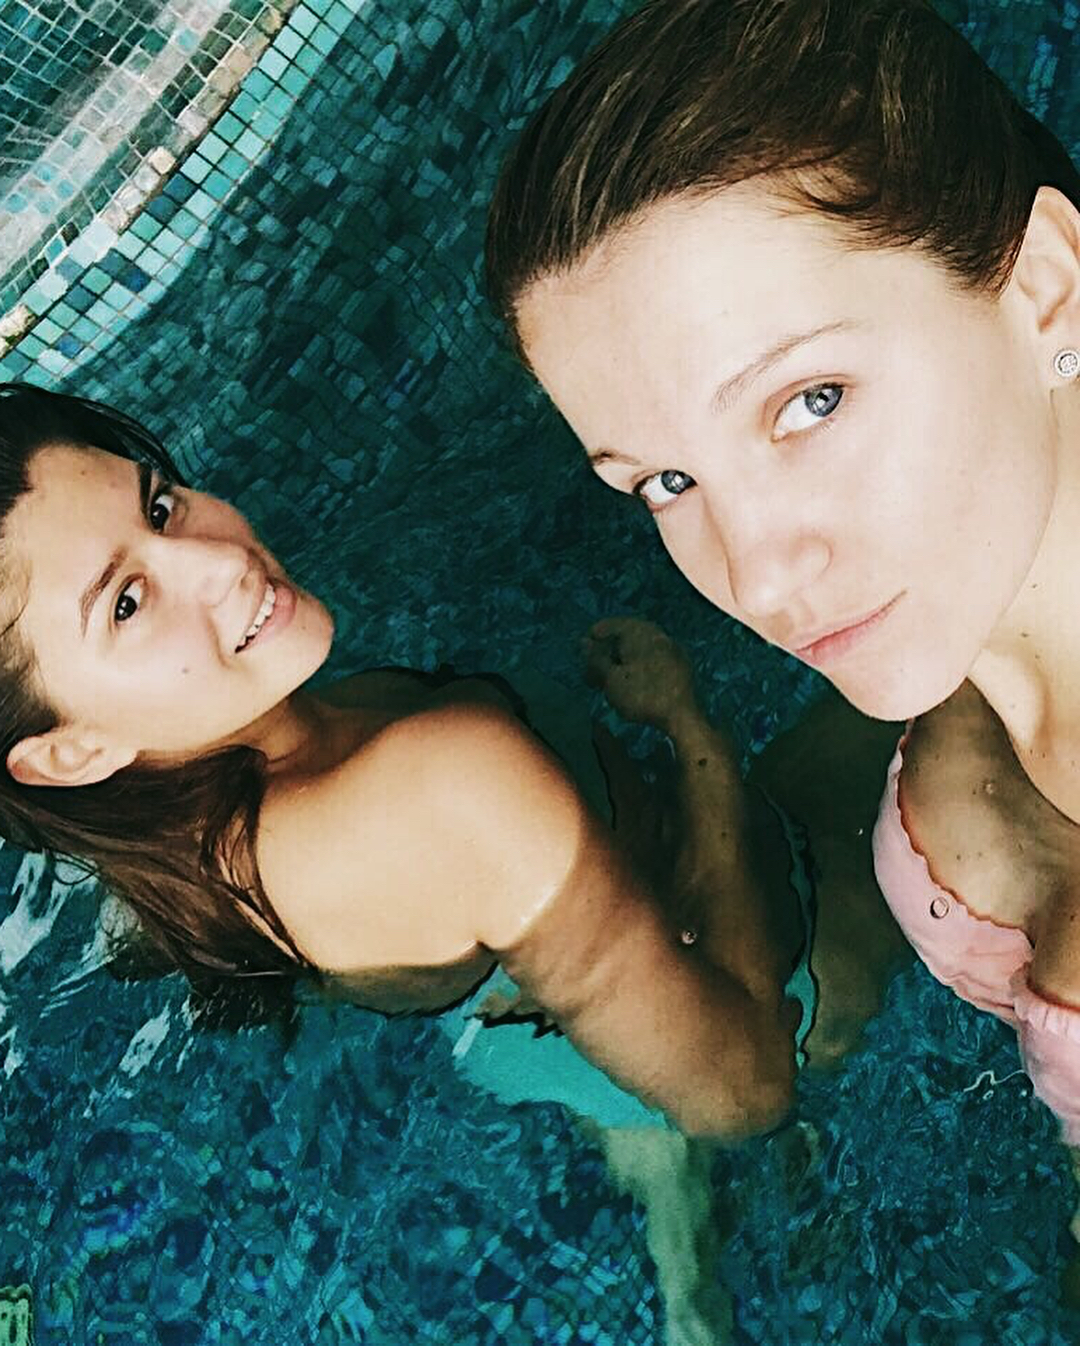 Женя Малахова: My #birthday girl, #my #shampagne partner,  @sofiabits, be happy, #mylove